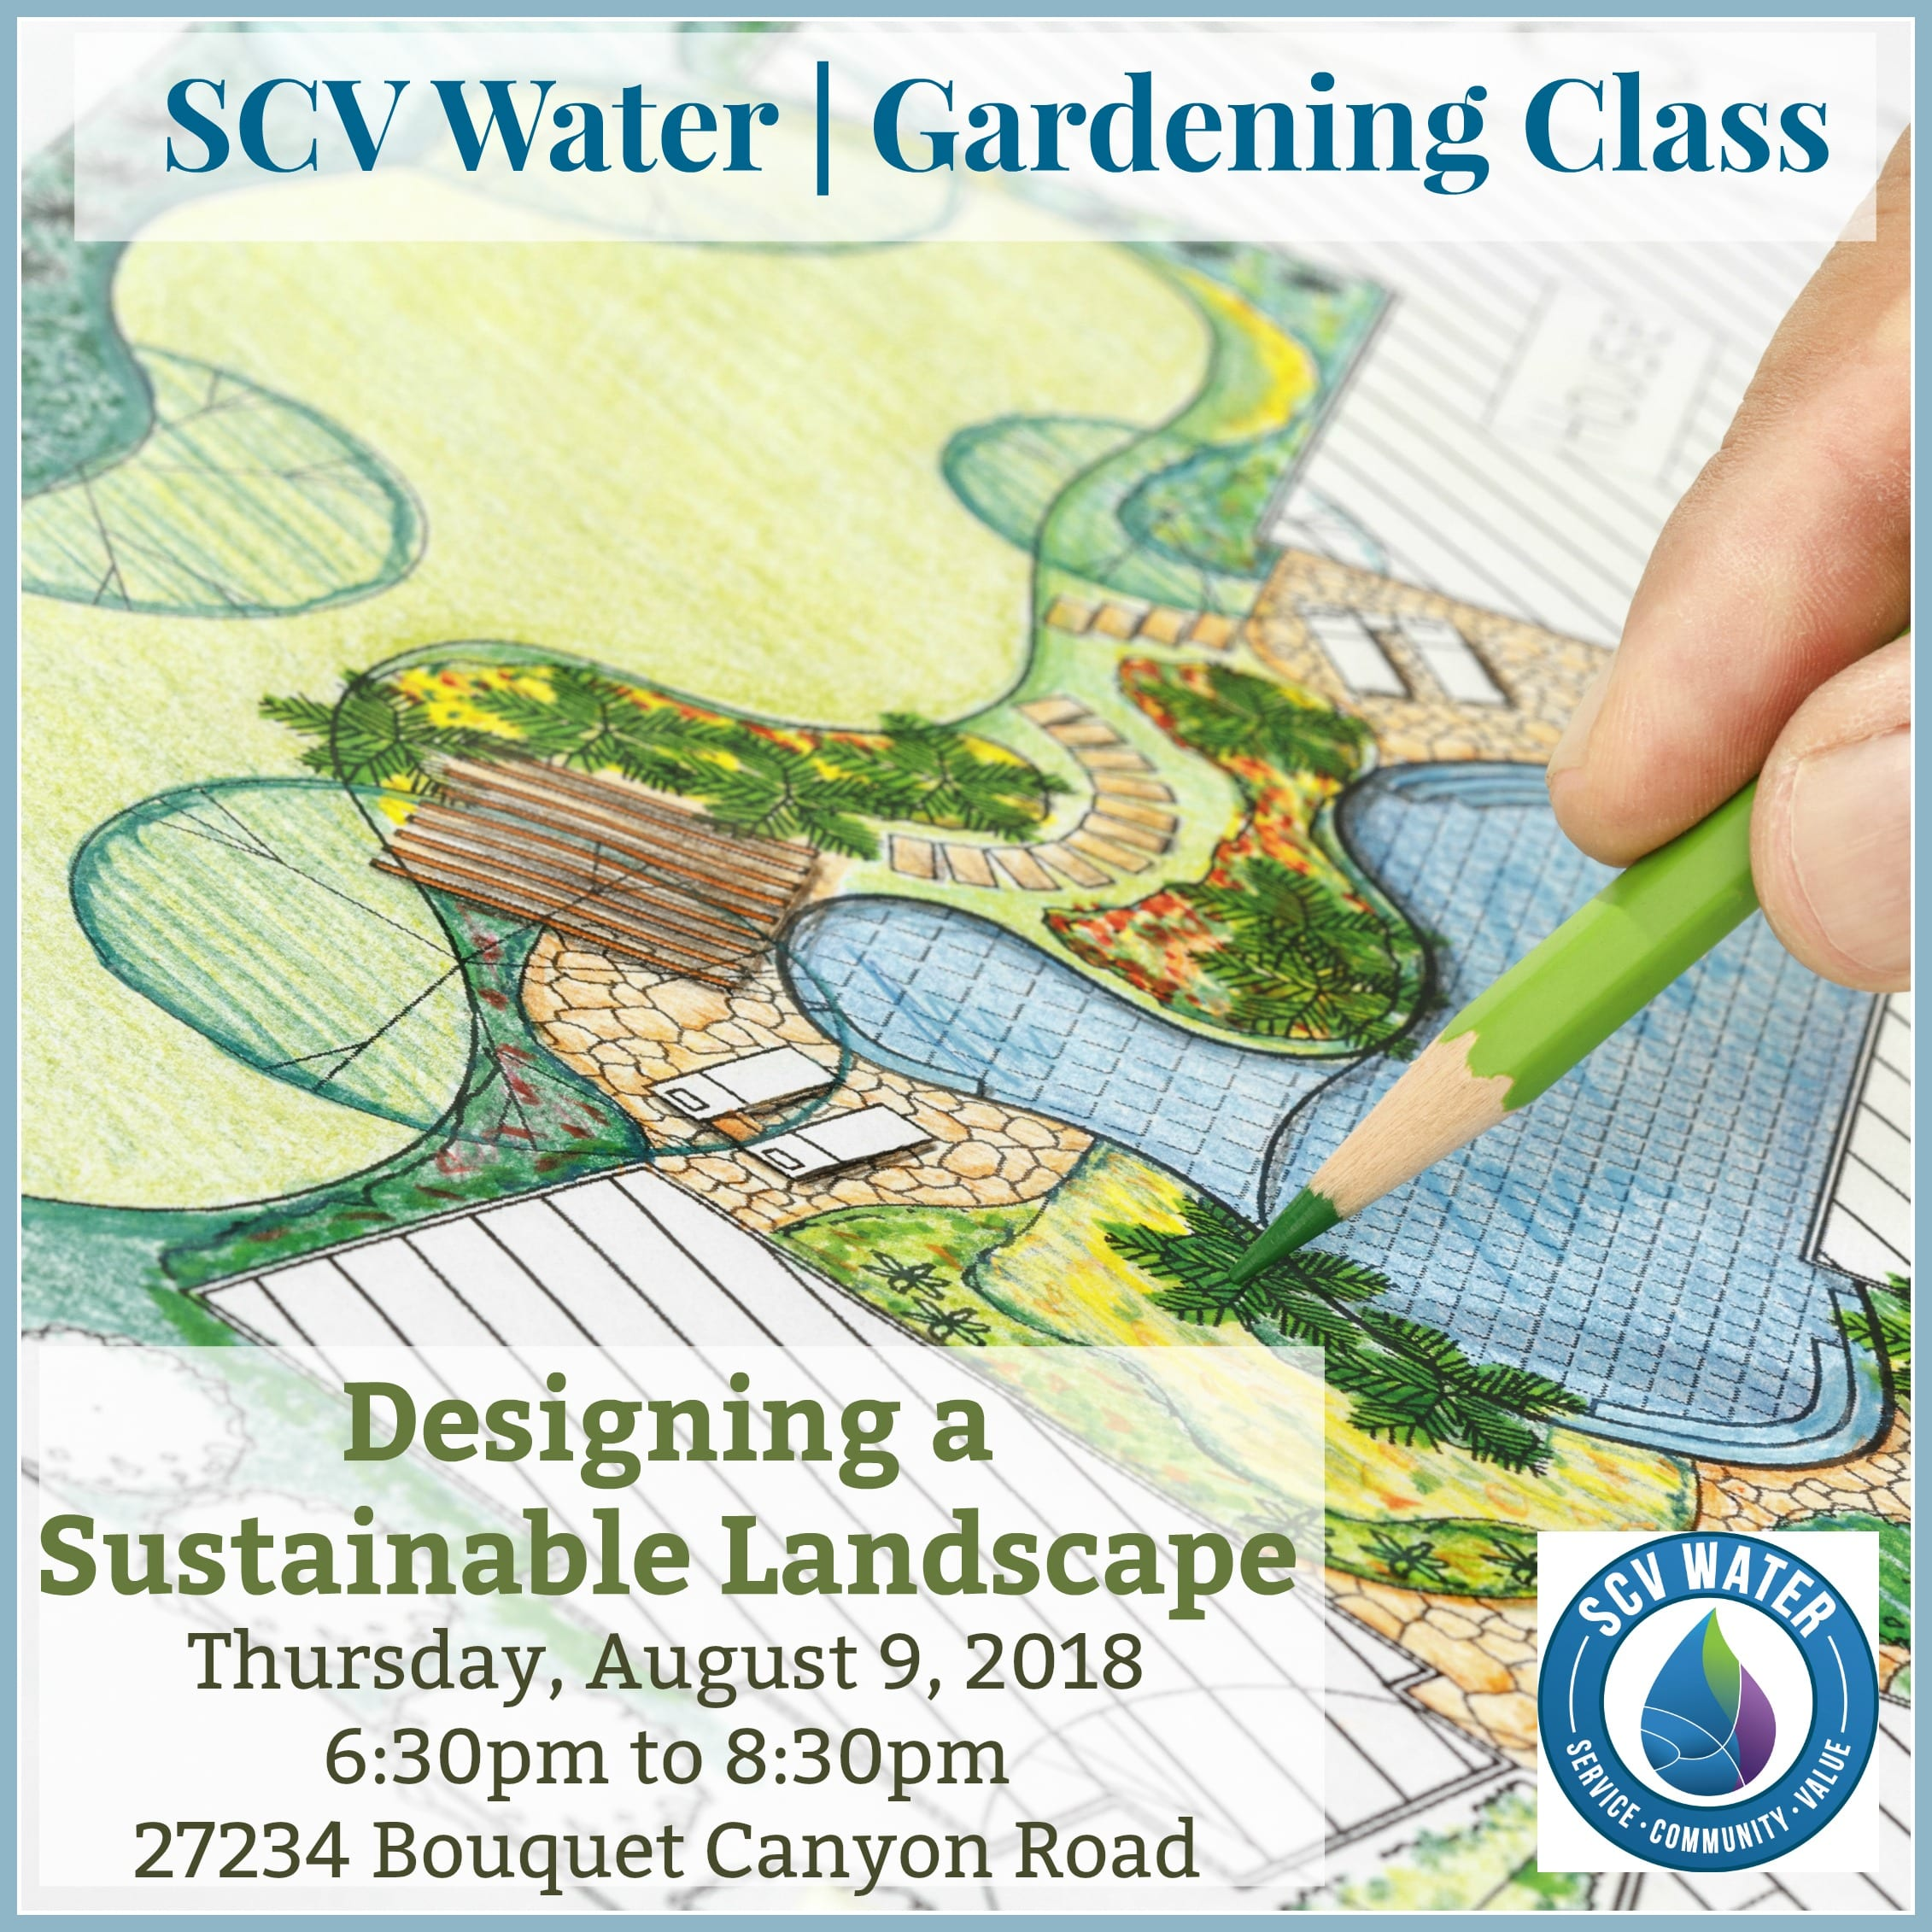 SCVNews.com | Aug. 9, 11: Free Landscape Design, Turf Care ...